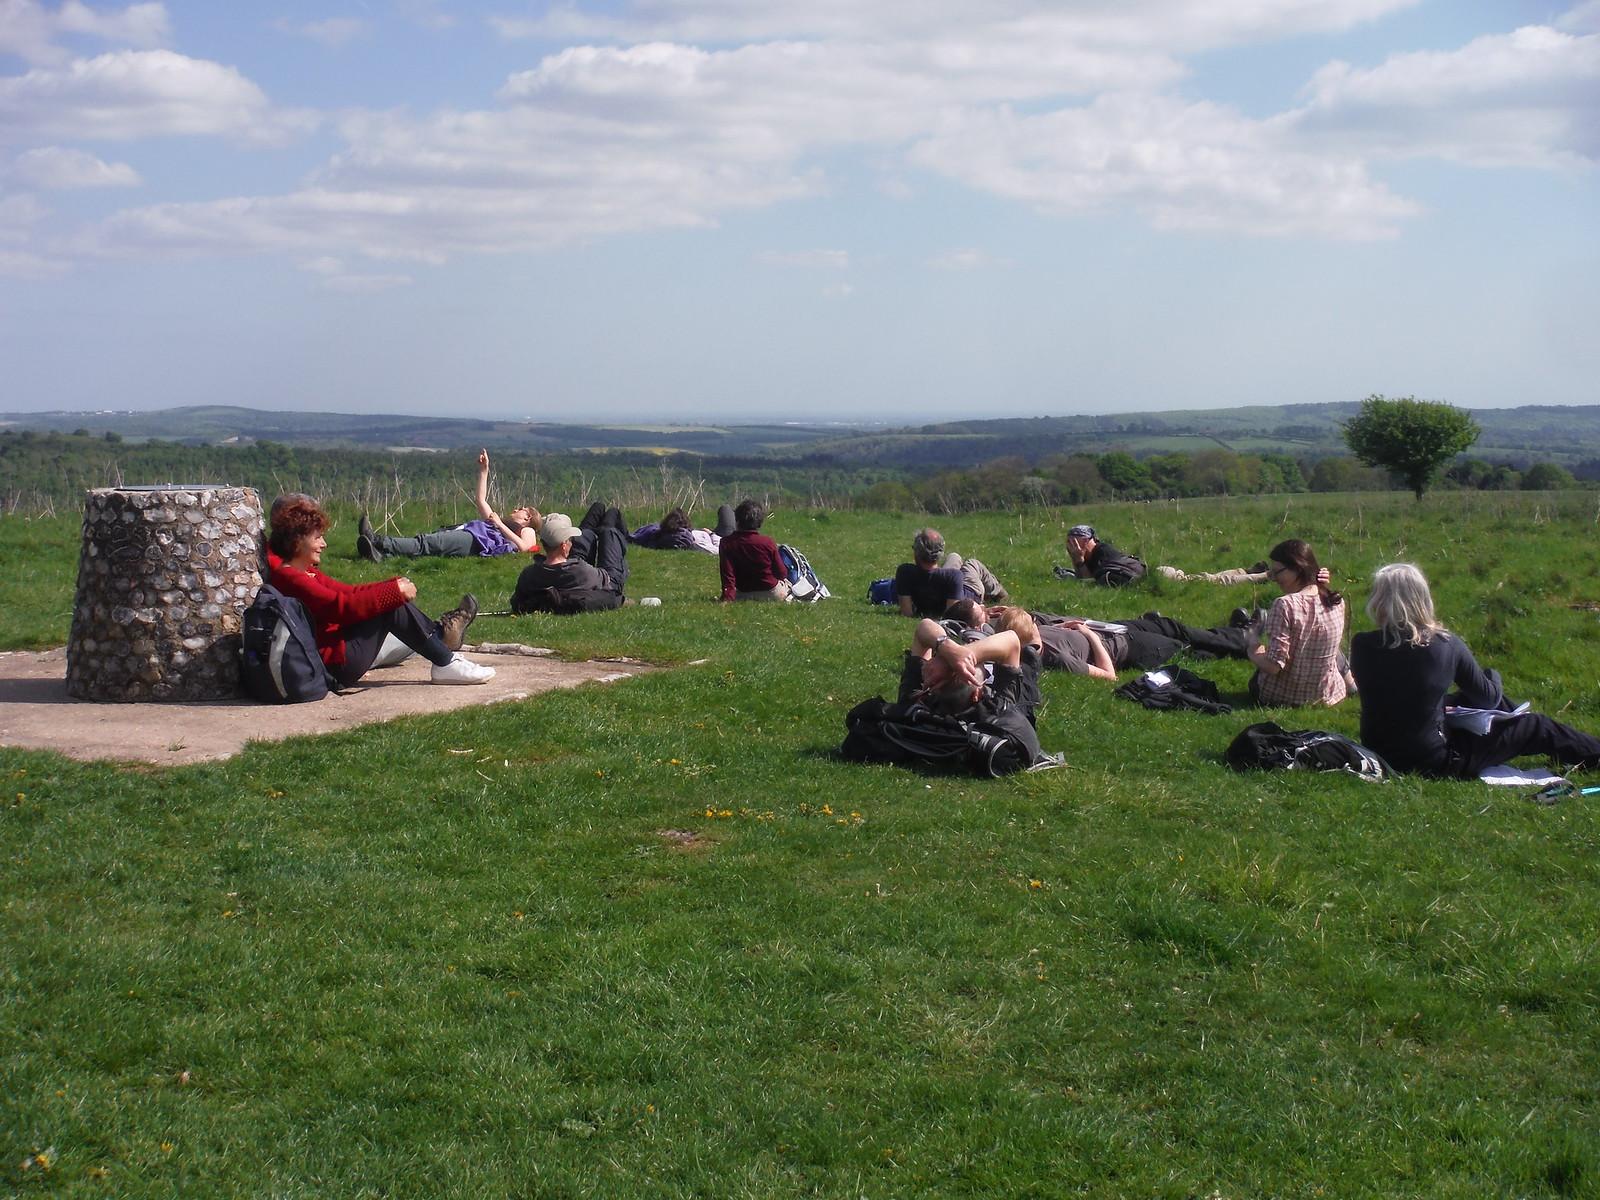 Toposcope on Beacon Hill, the SWC having a sunny break SWC Walk Rowlands Castle Circular - Extension